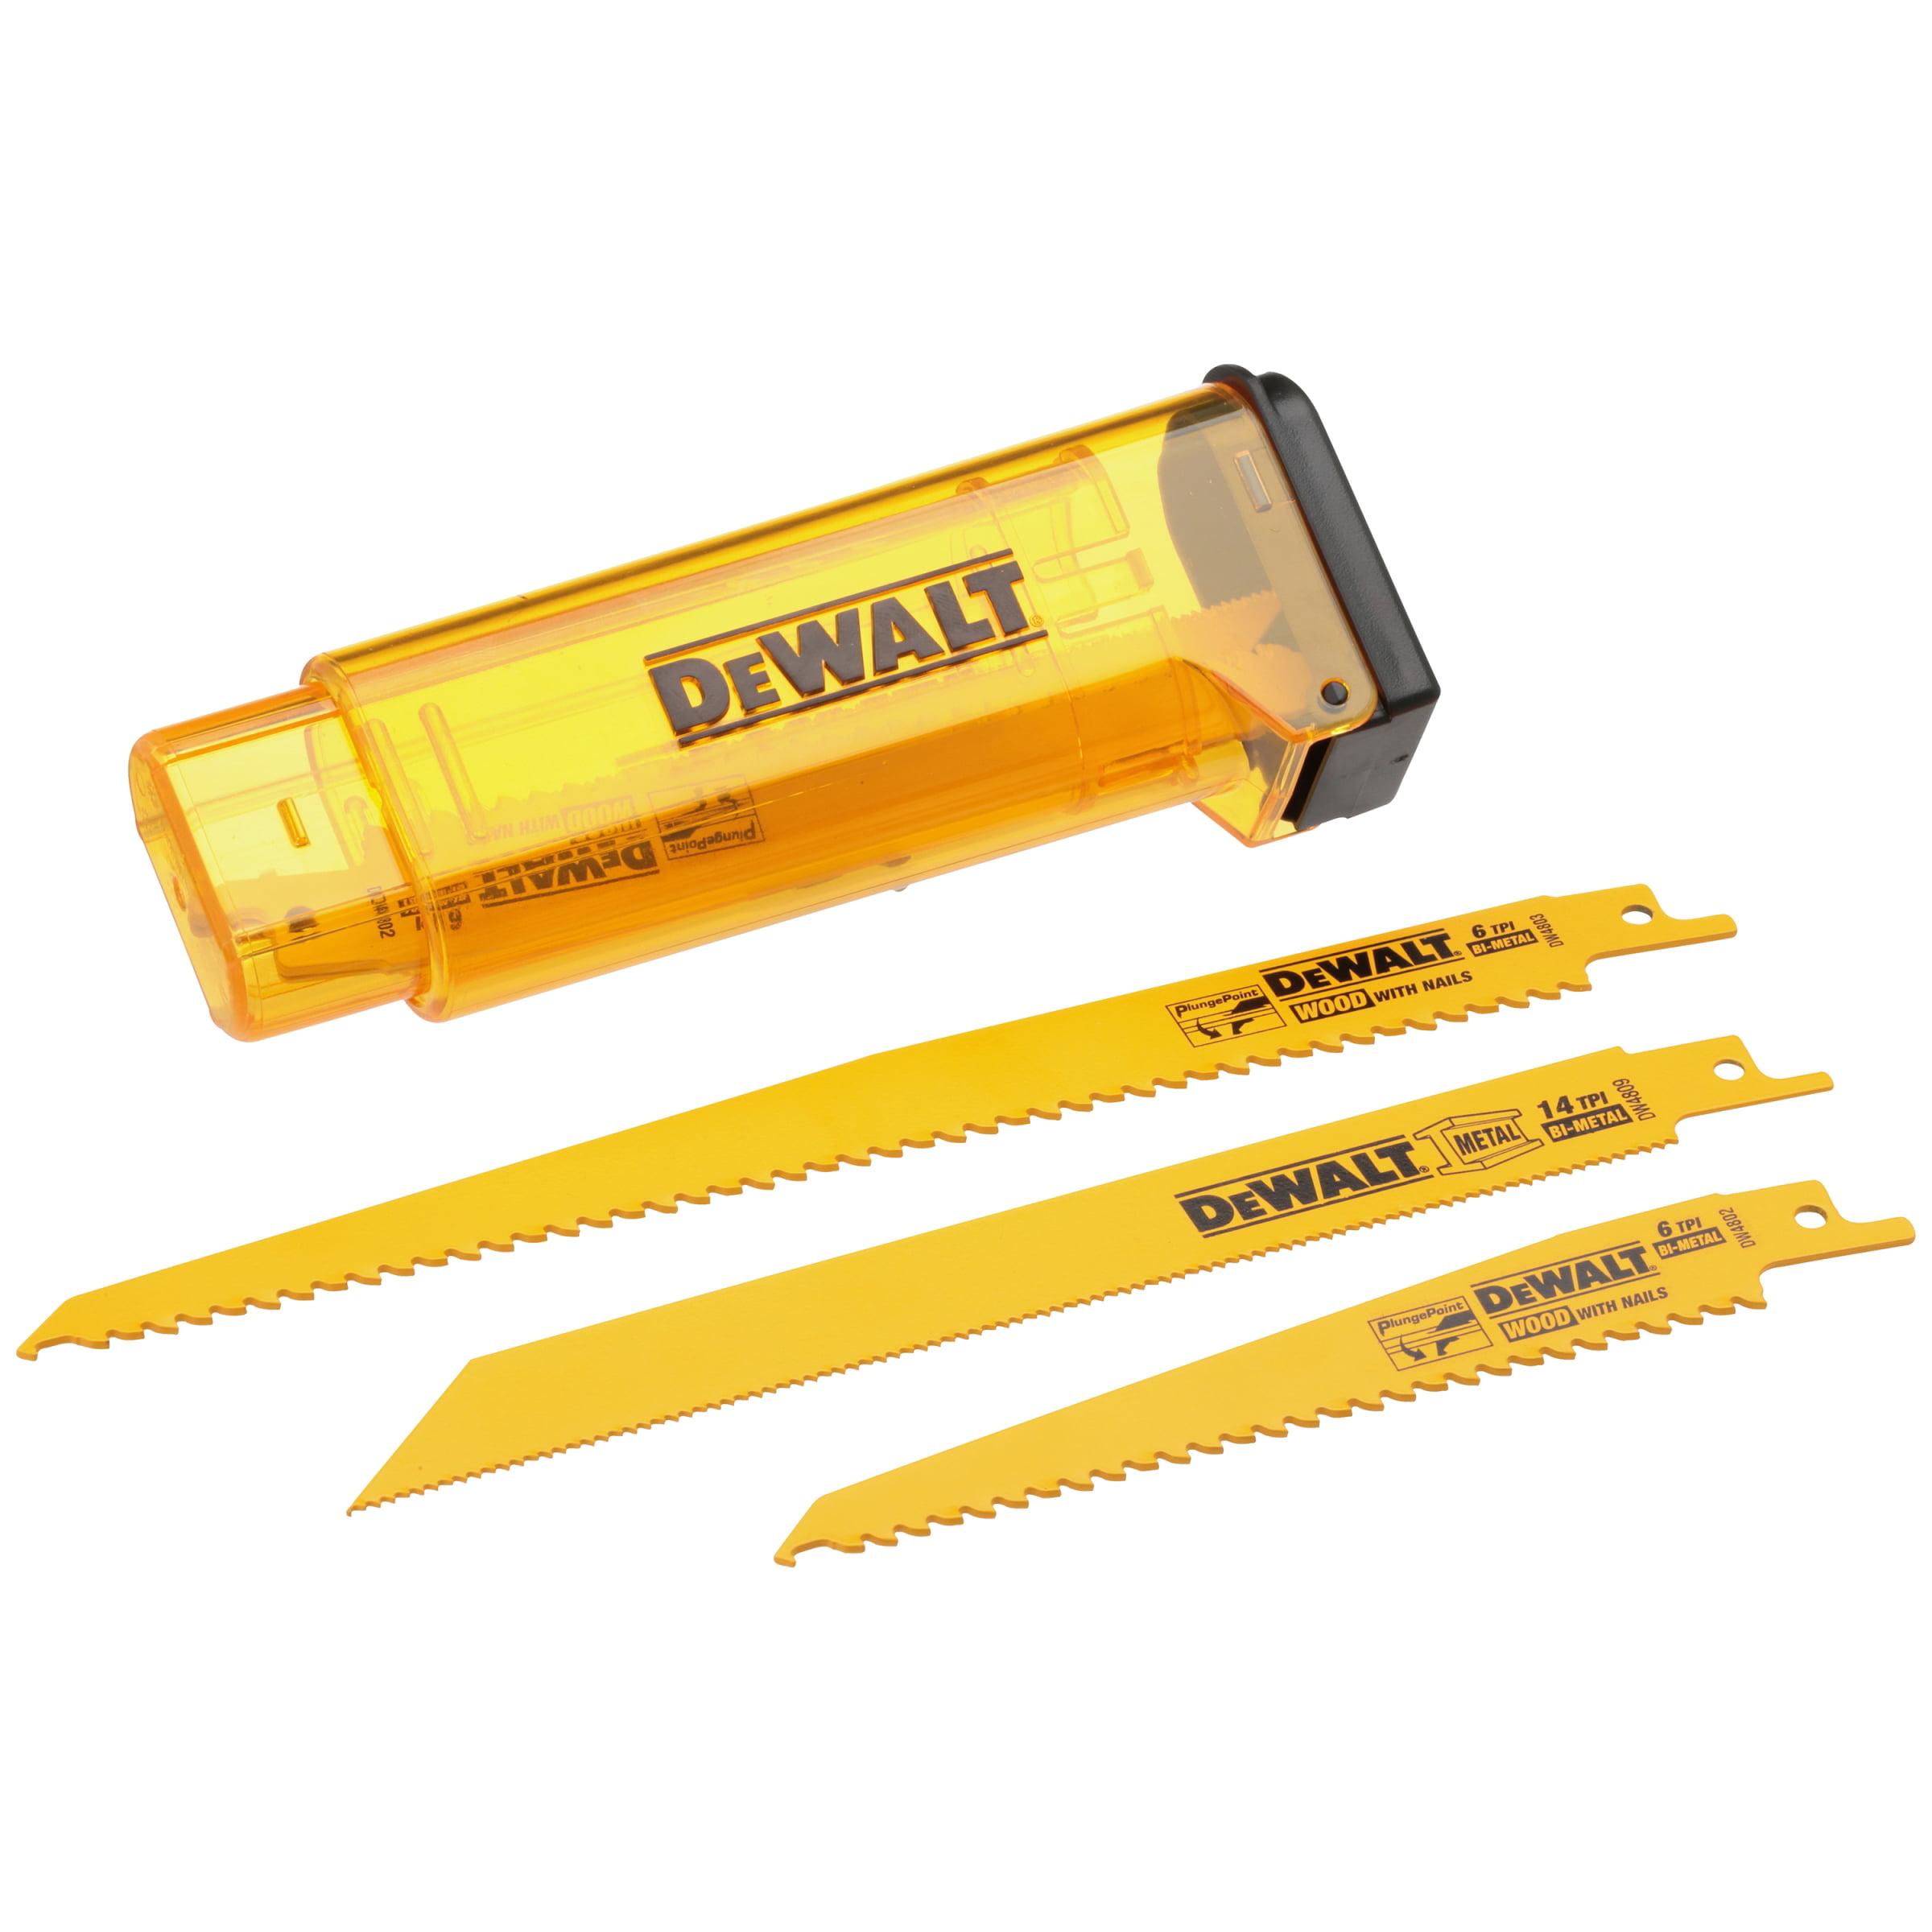 Dewalt® Reciprocating Saw Blade Kit 11 pc Carded Pack